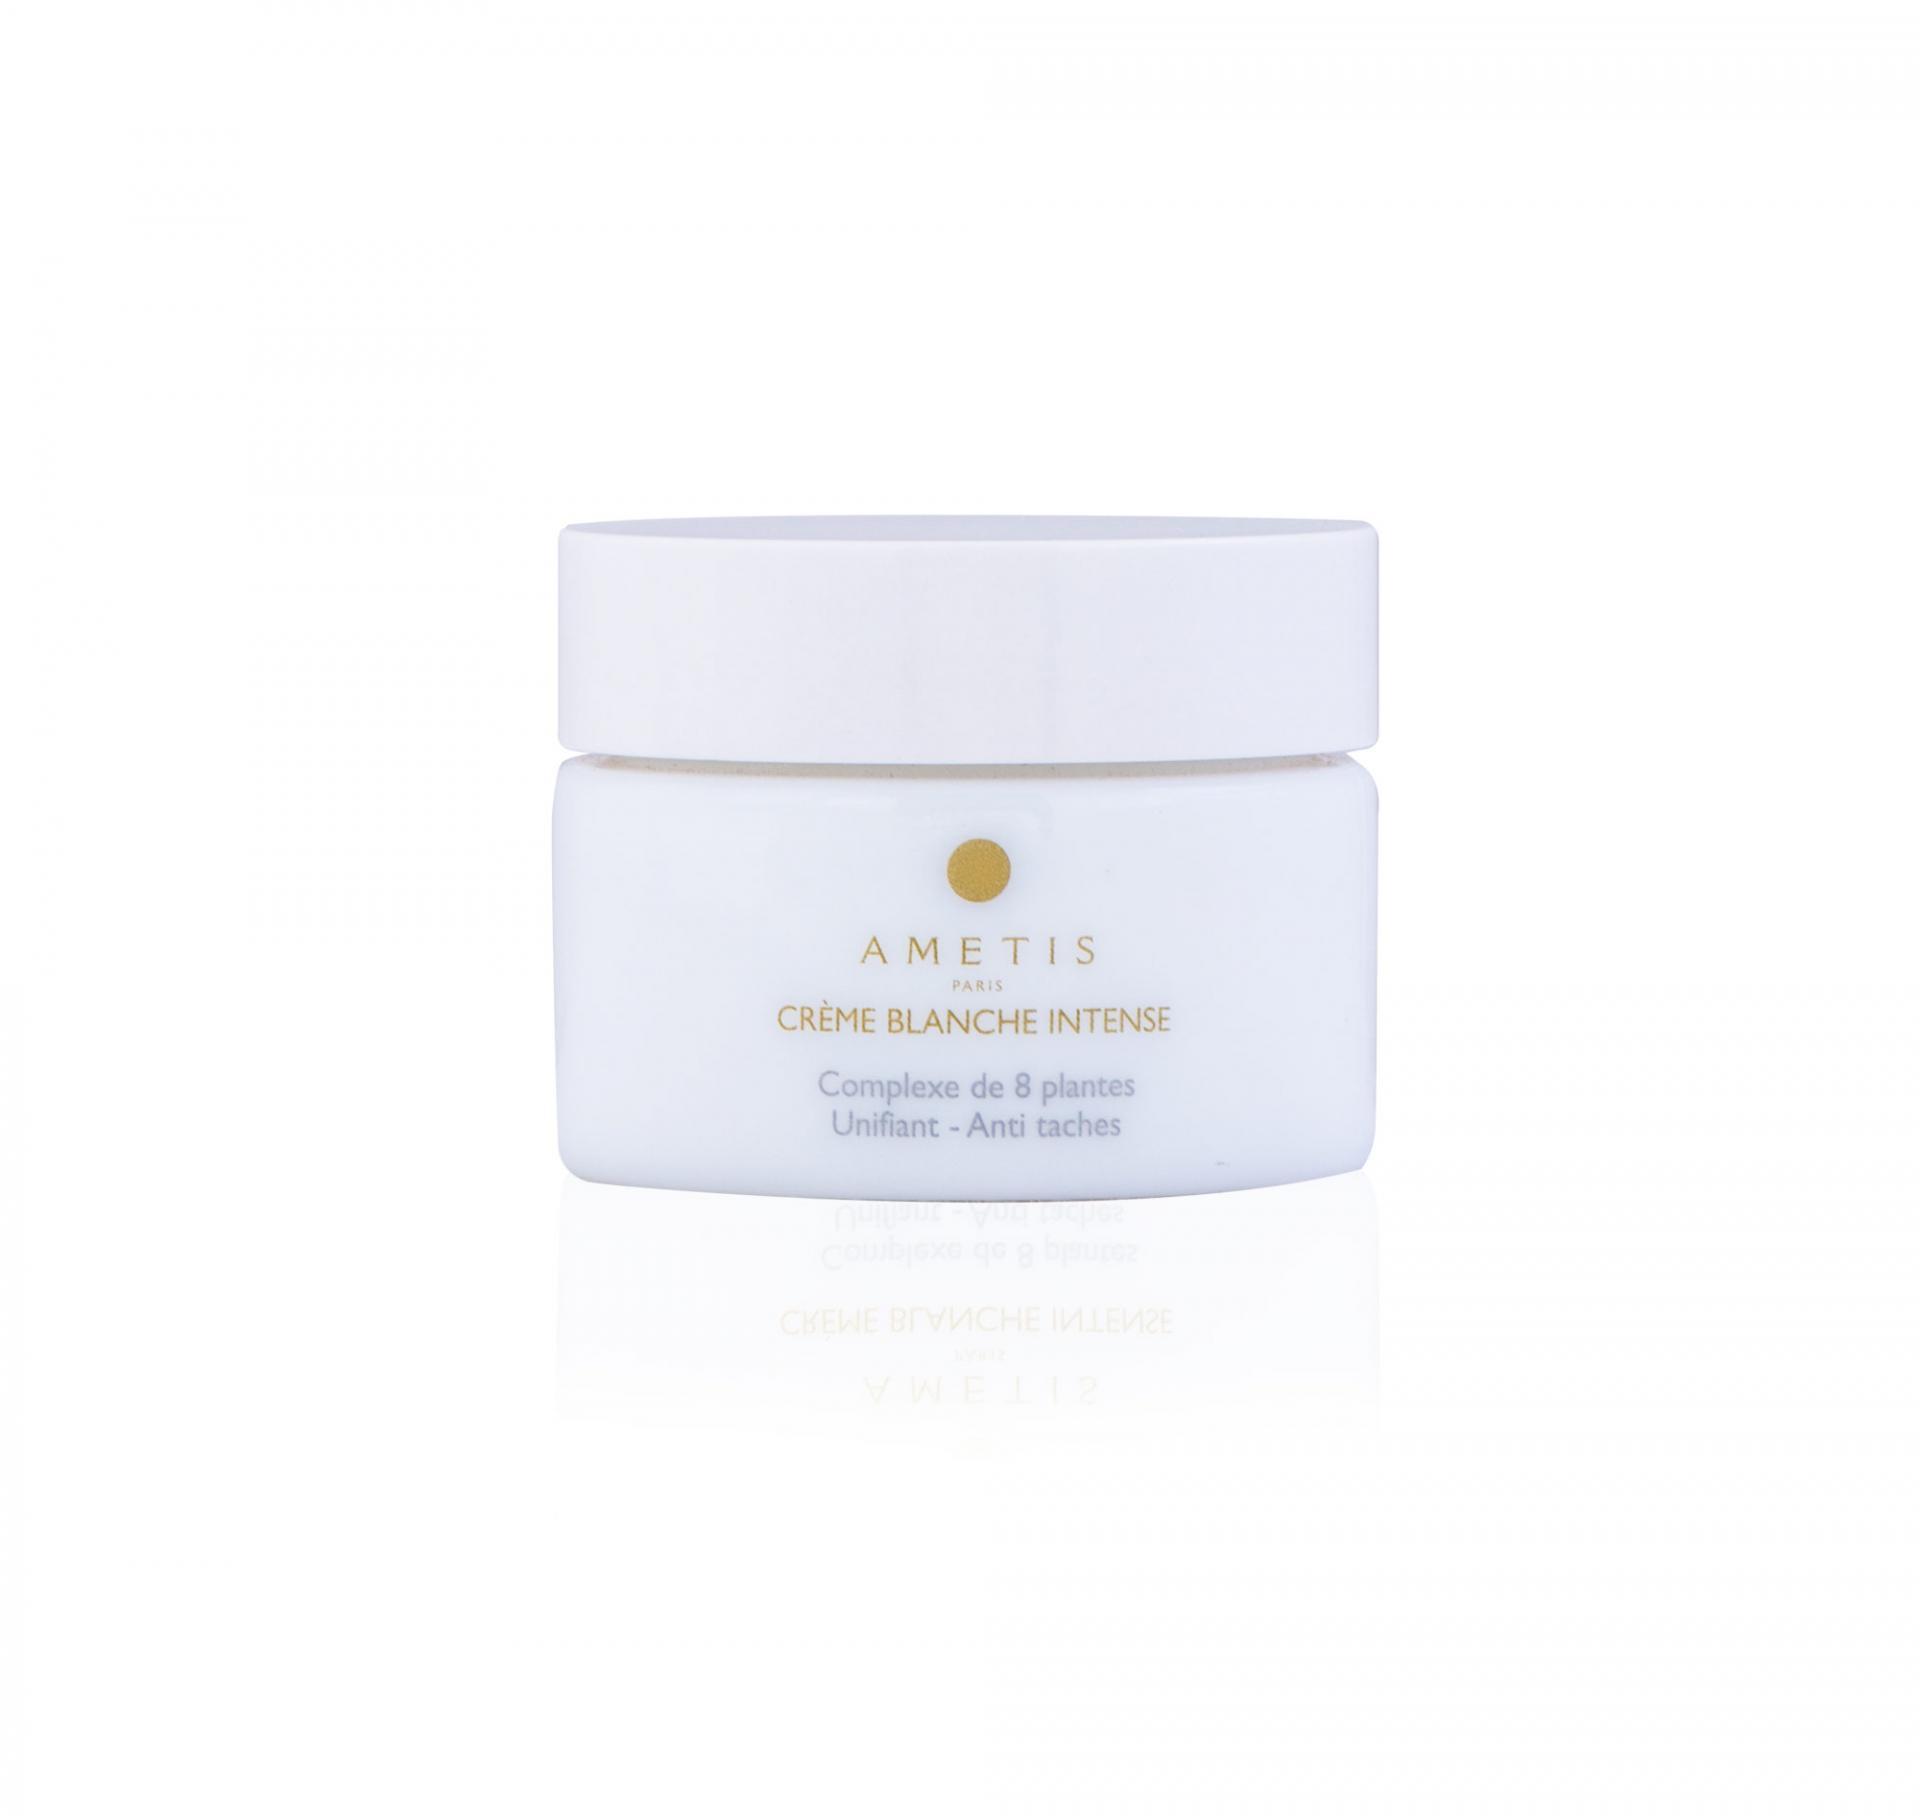 Creme blanche intense ametis cosmetics 2000x1892